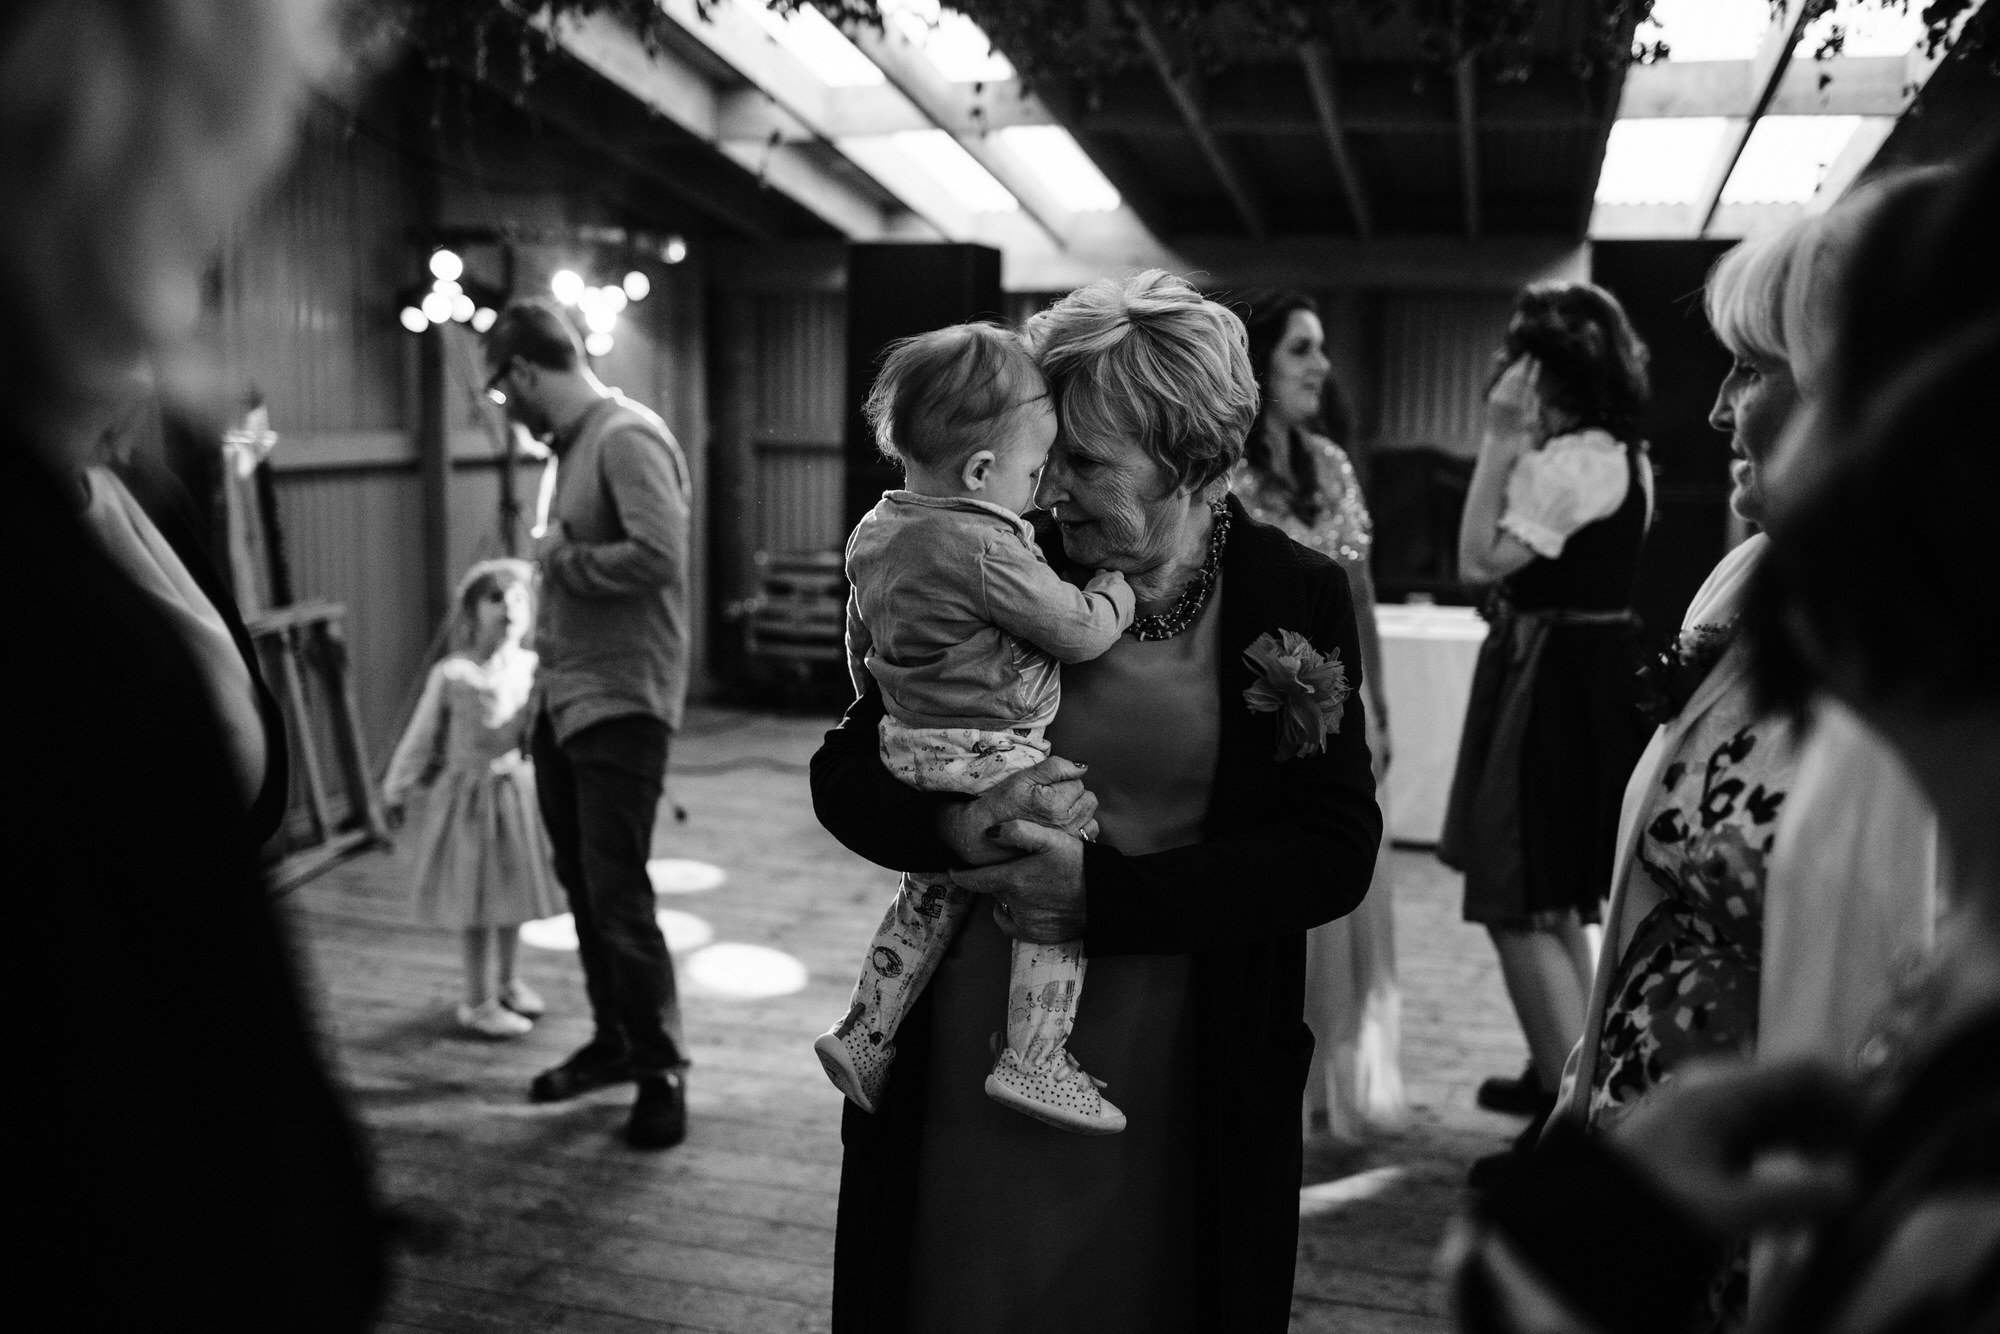 065 TIN SHED KNOCKRAICH WEDDING AUSTRIAN SCOTTISH ZOE ALEXANDRA PHOTOGRAPHY